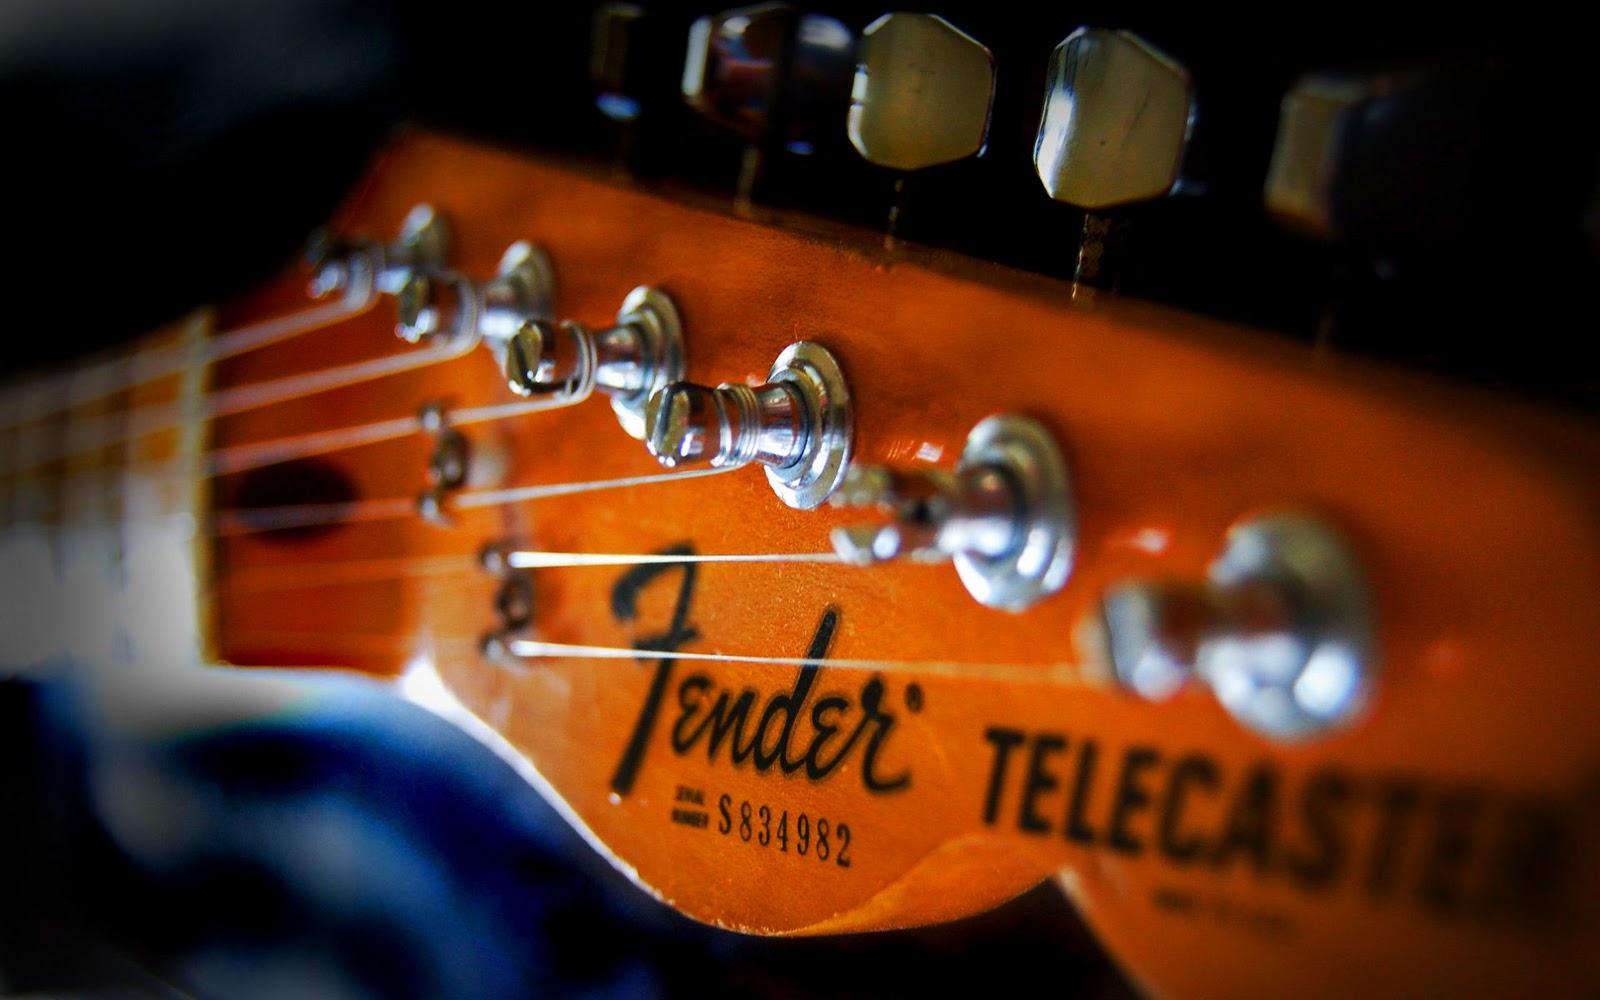 Fender-Telecaster-Head-Headstock-Strings-Tuners-Music-Desktop-HD-Wallpaper-1920x1200-www.greatguitarsound.blogspot.com_1